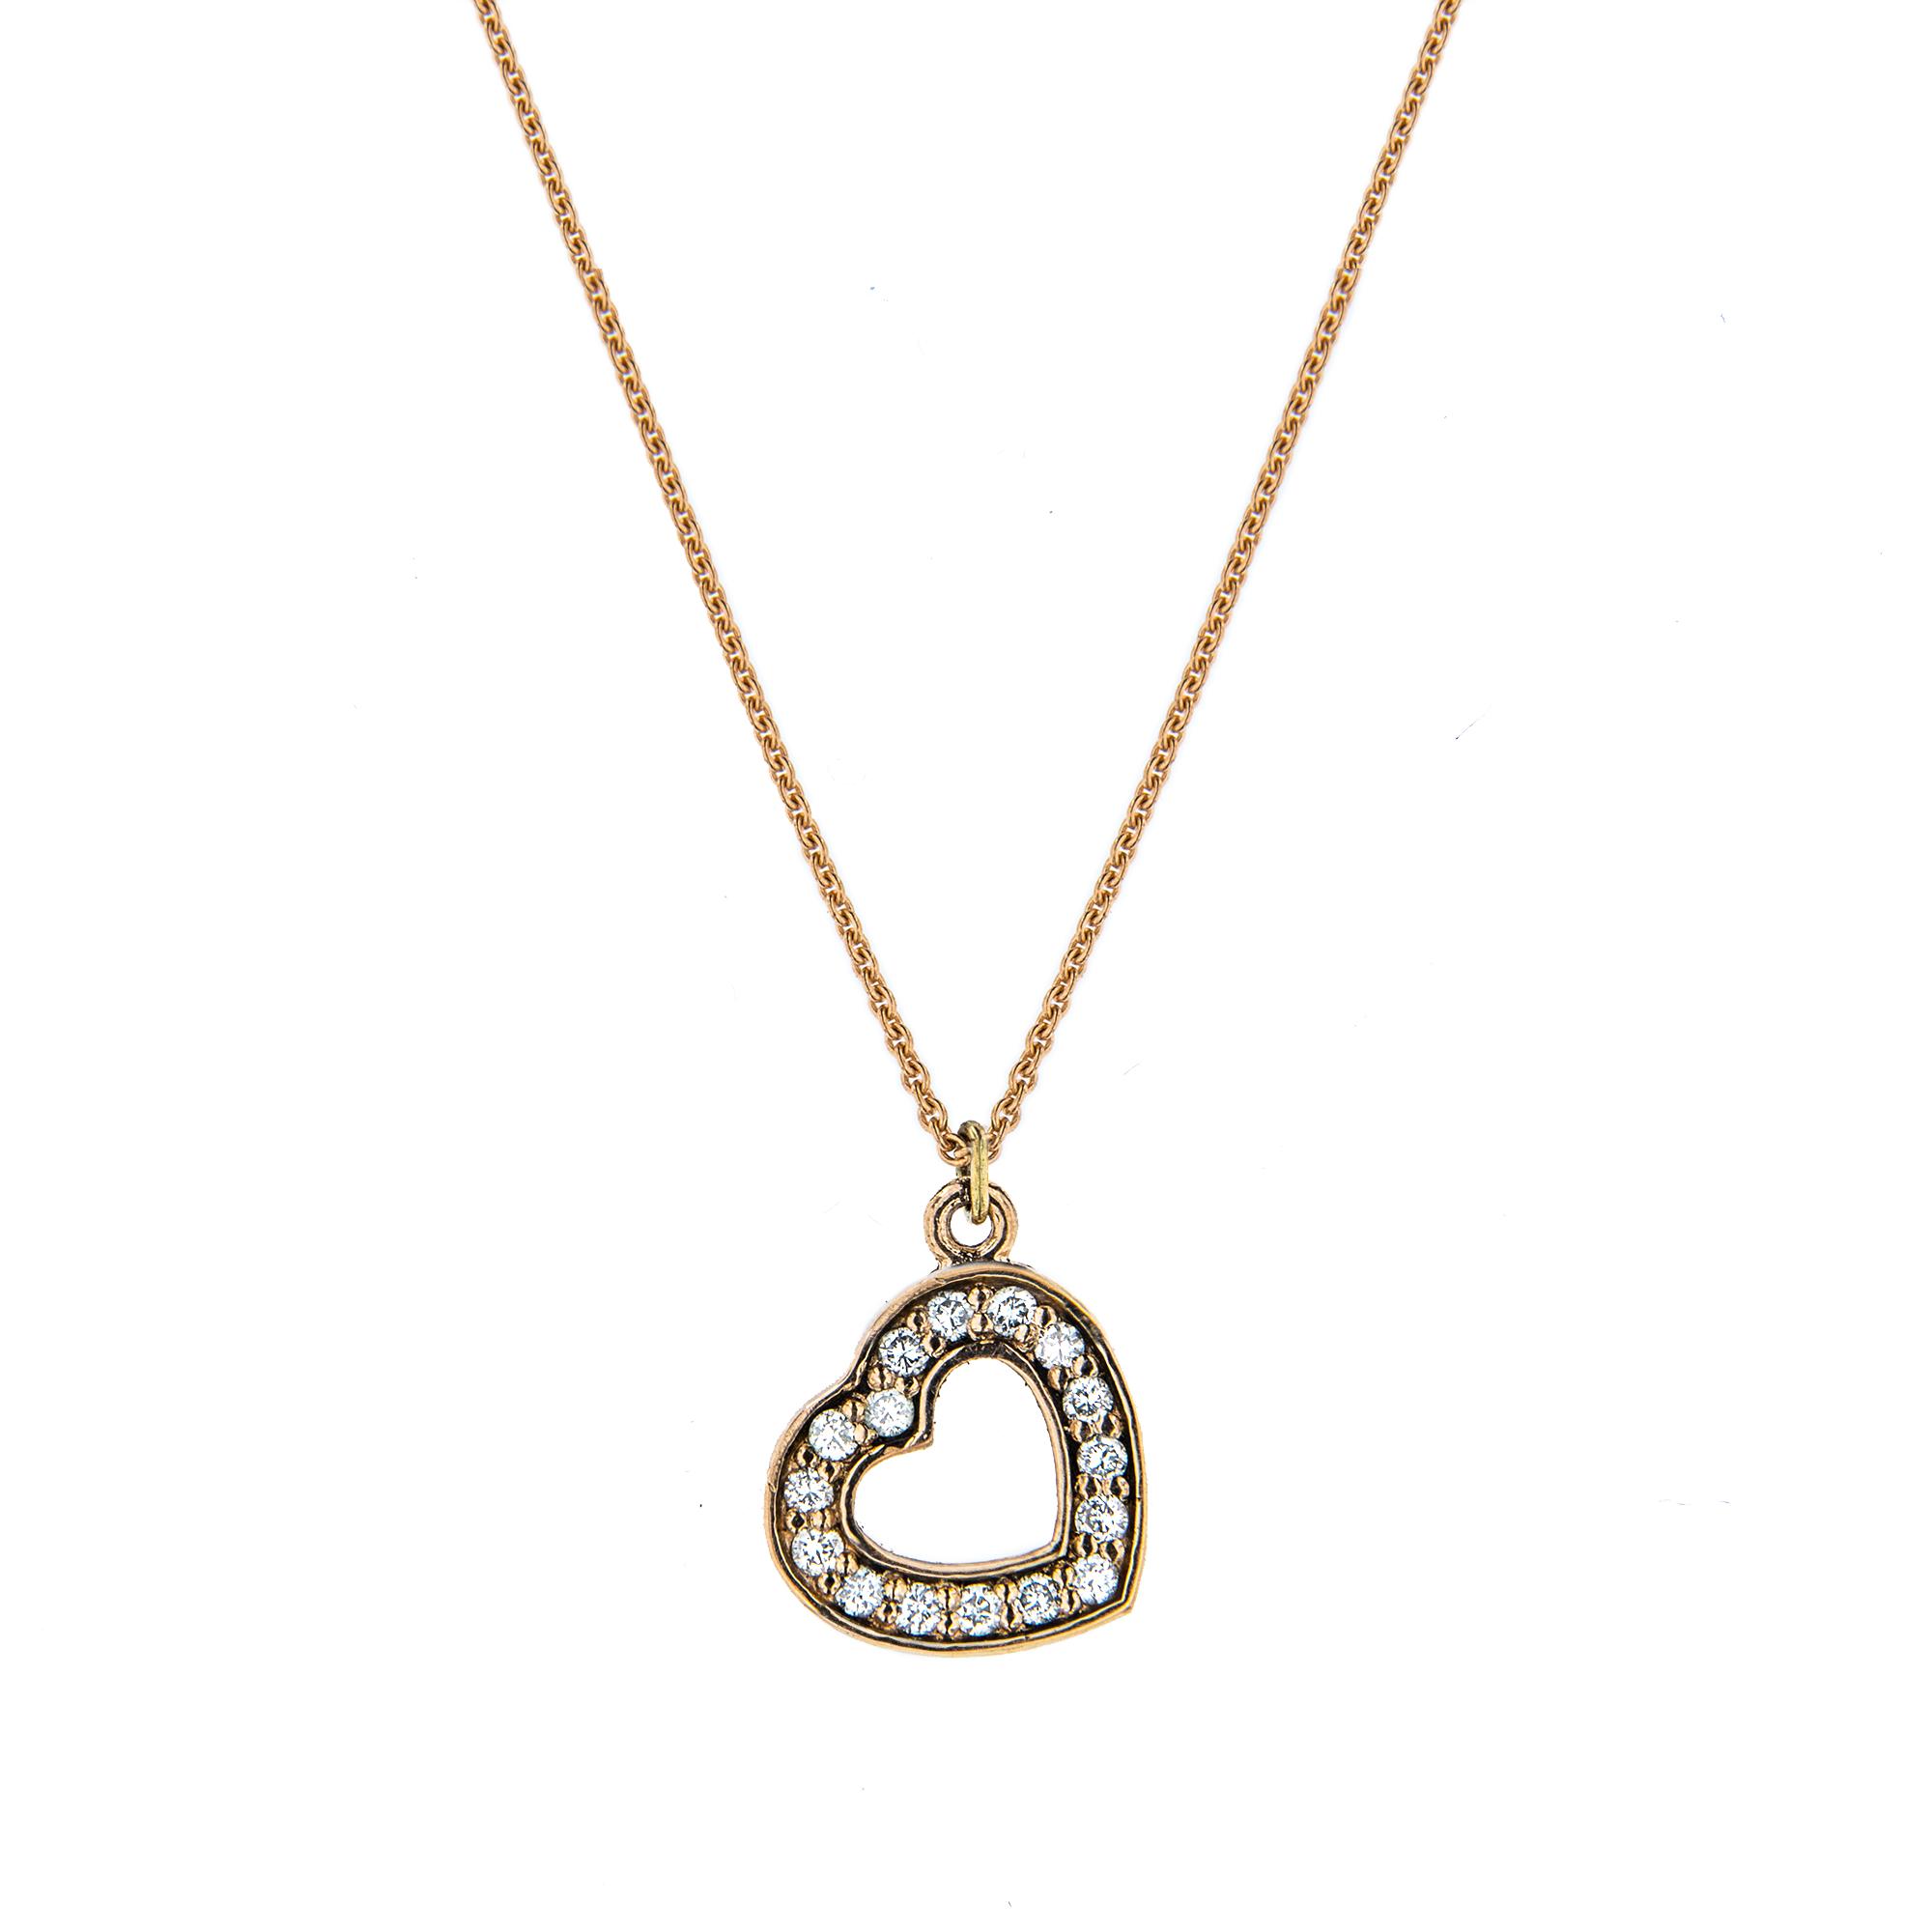 LOVE pøívìsek ve tvaru srdce vyroben ze  žlutého 14 karátového zlata  - zvìtšit obrázek